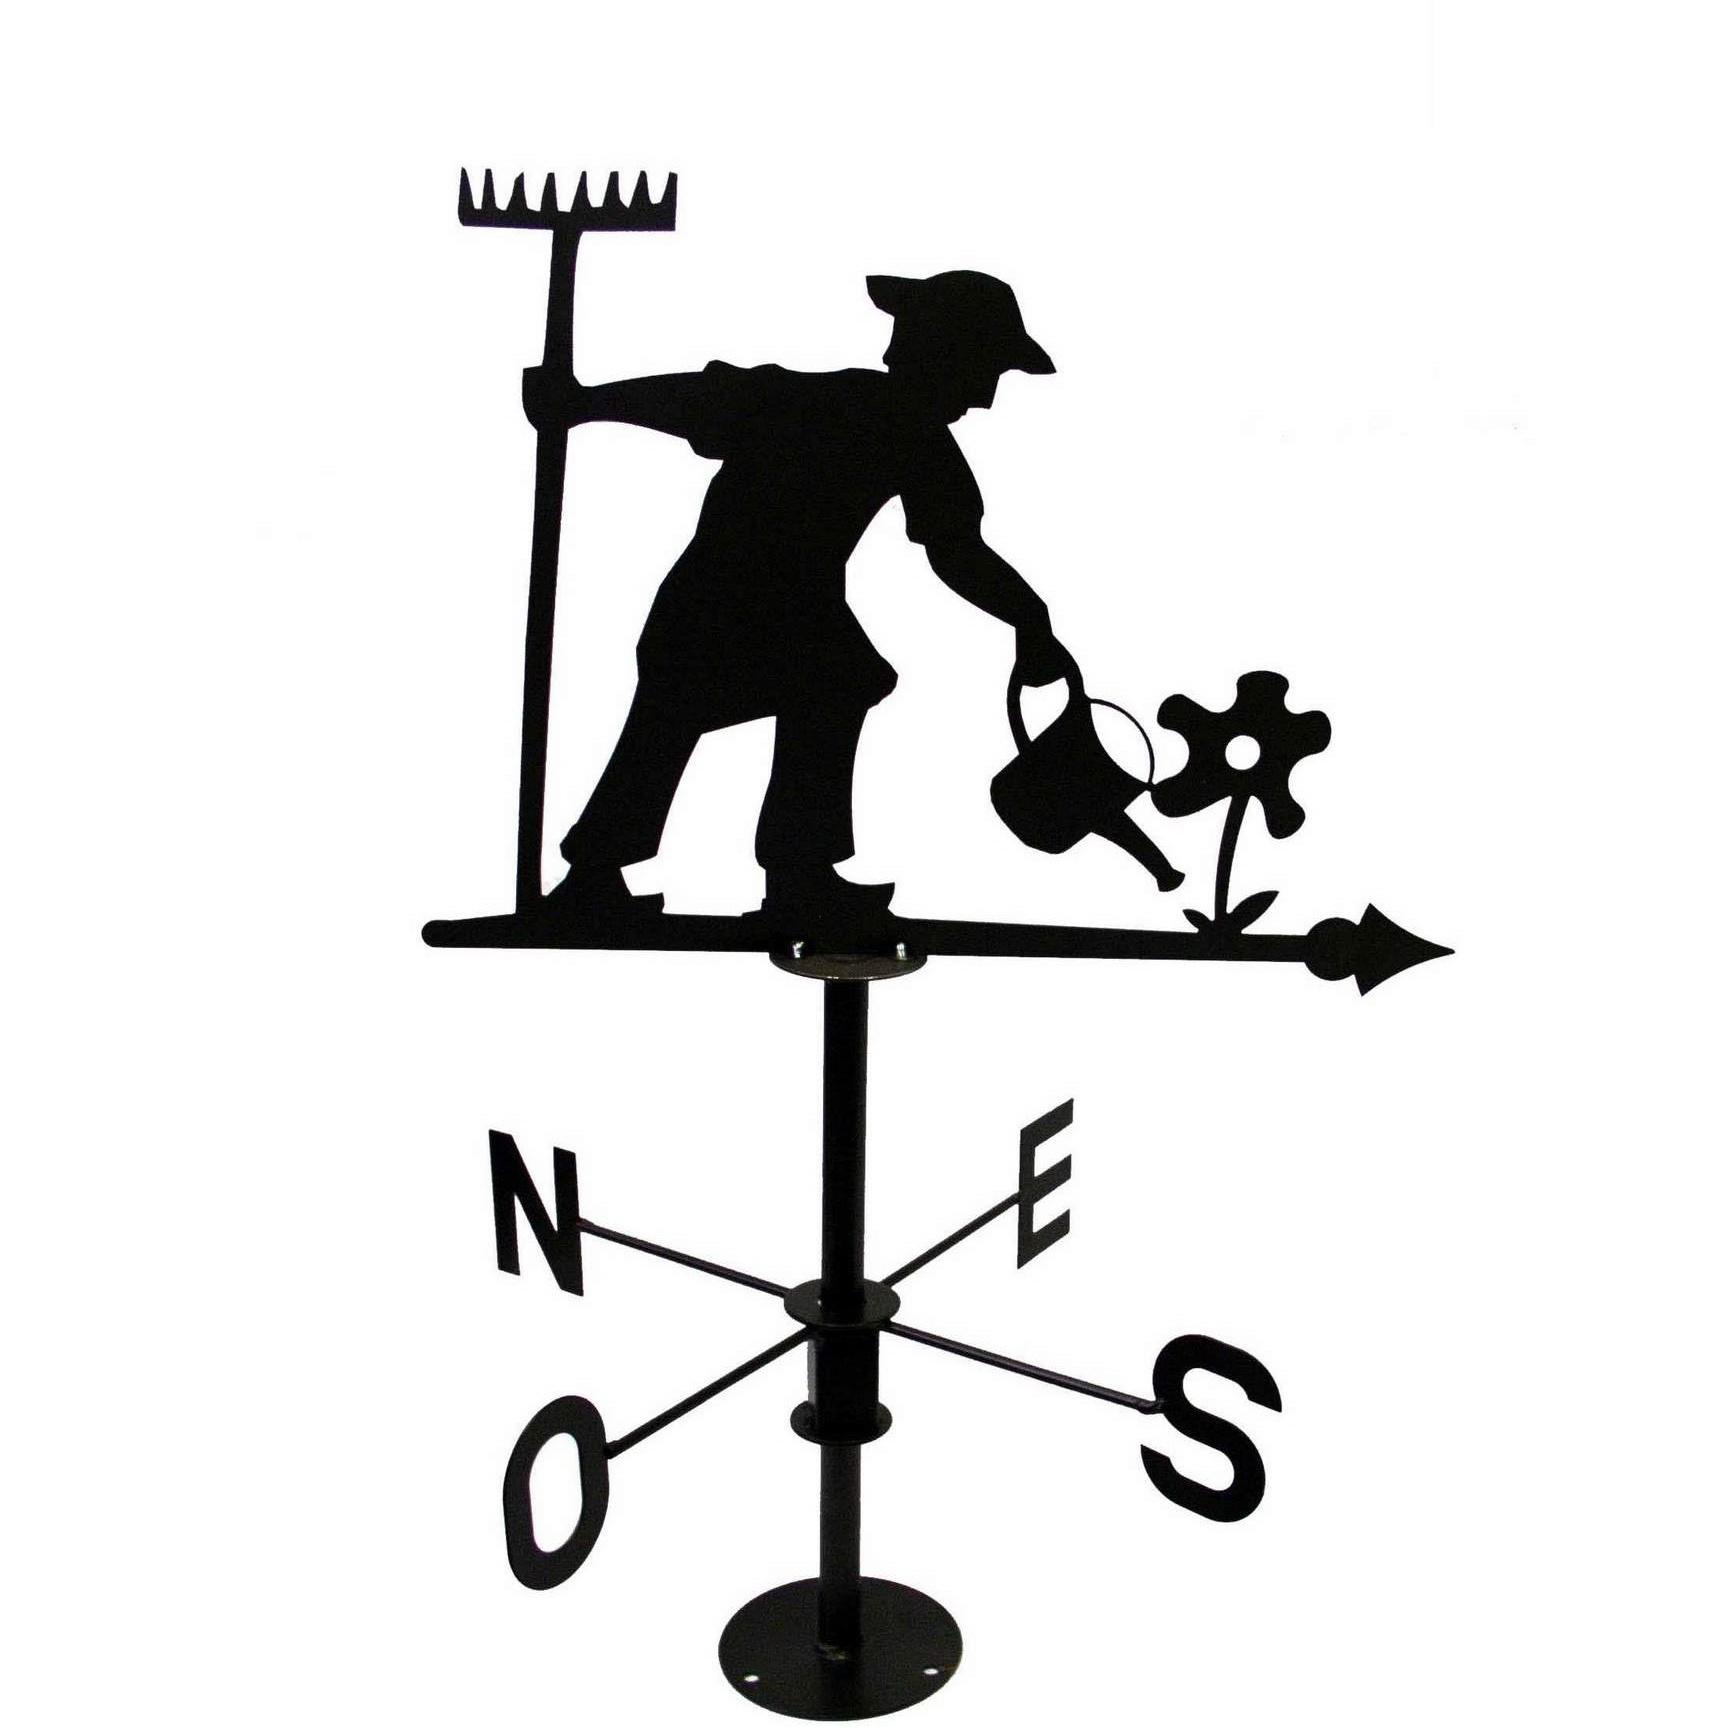 Girouette Jardinier, Gris Métal, Jardifer® avec Girouette De Jardin